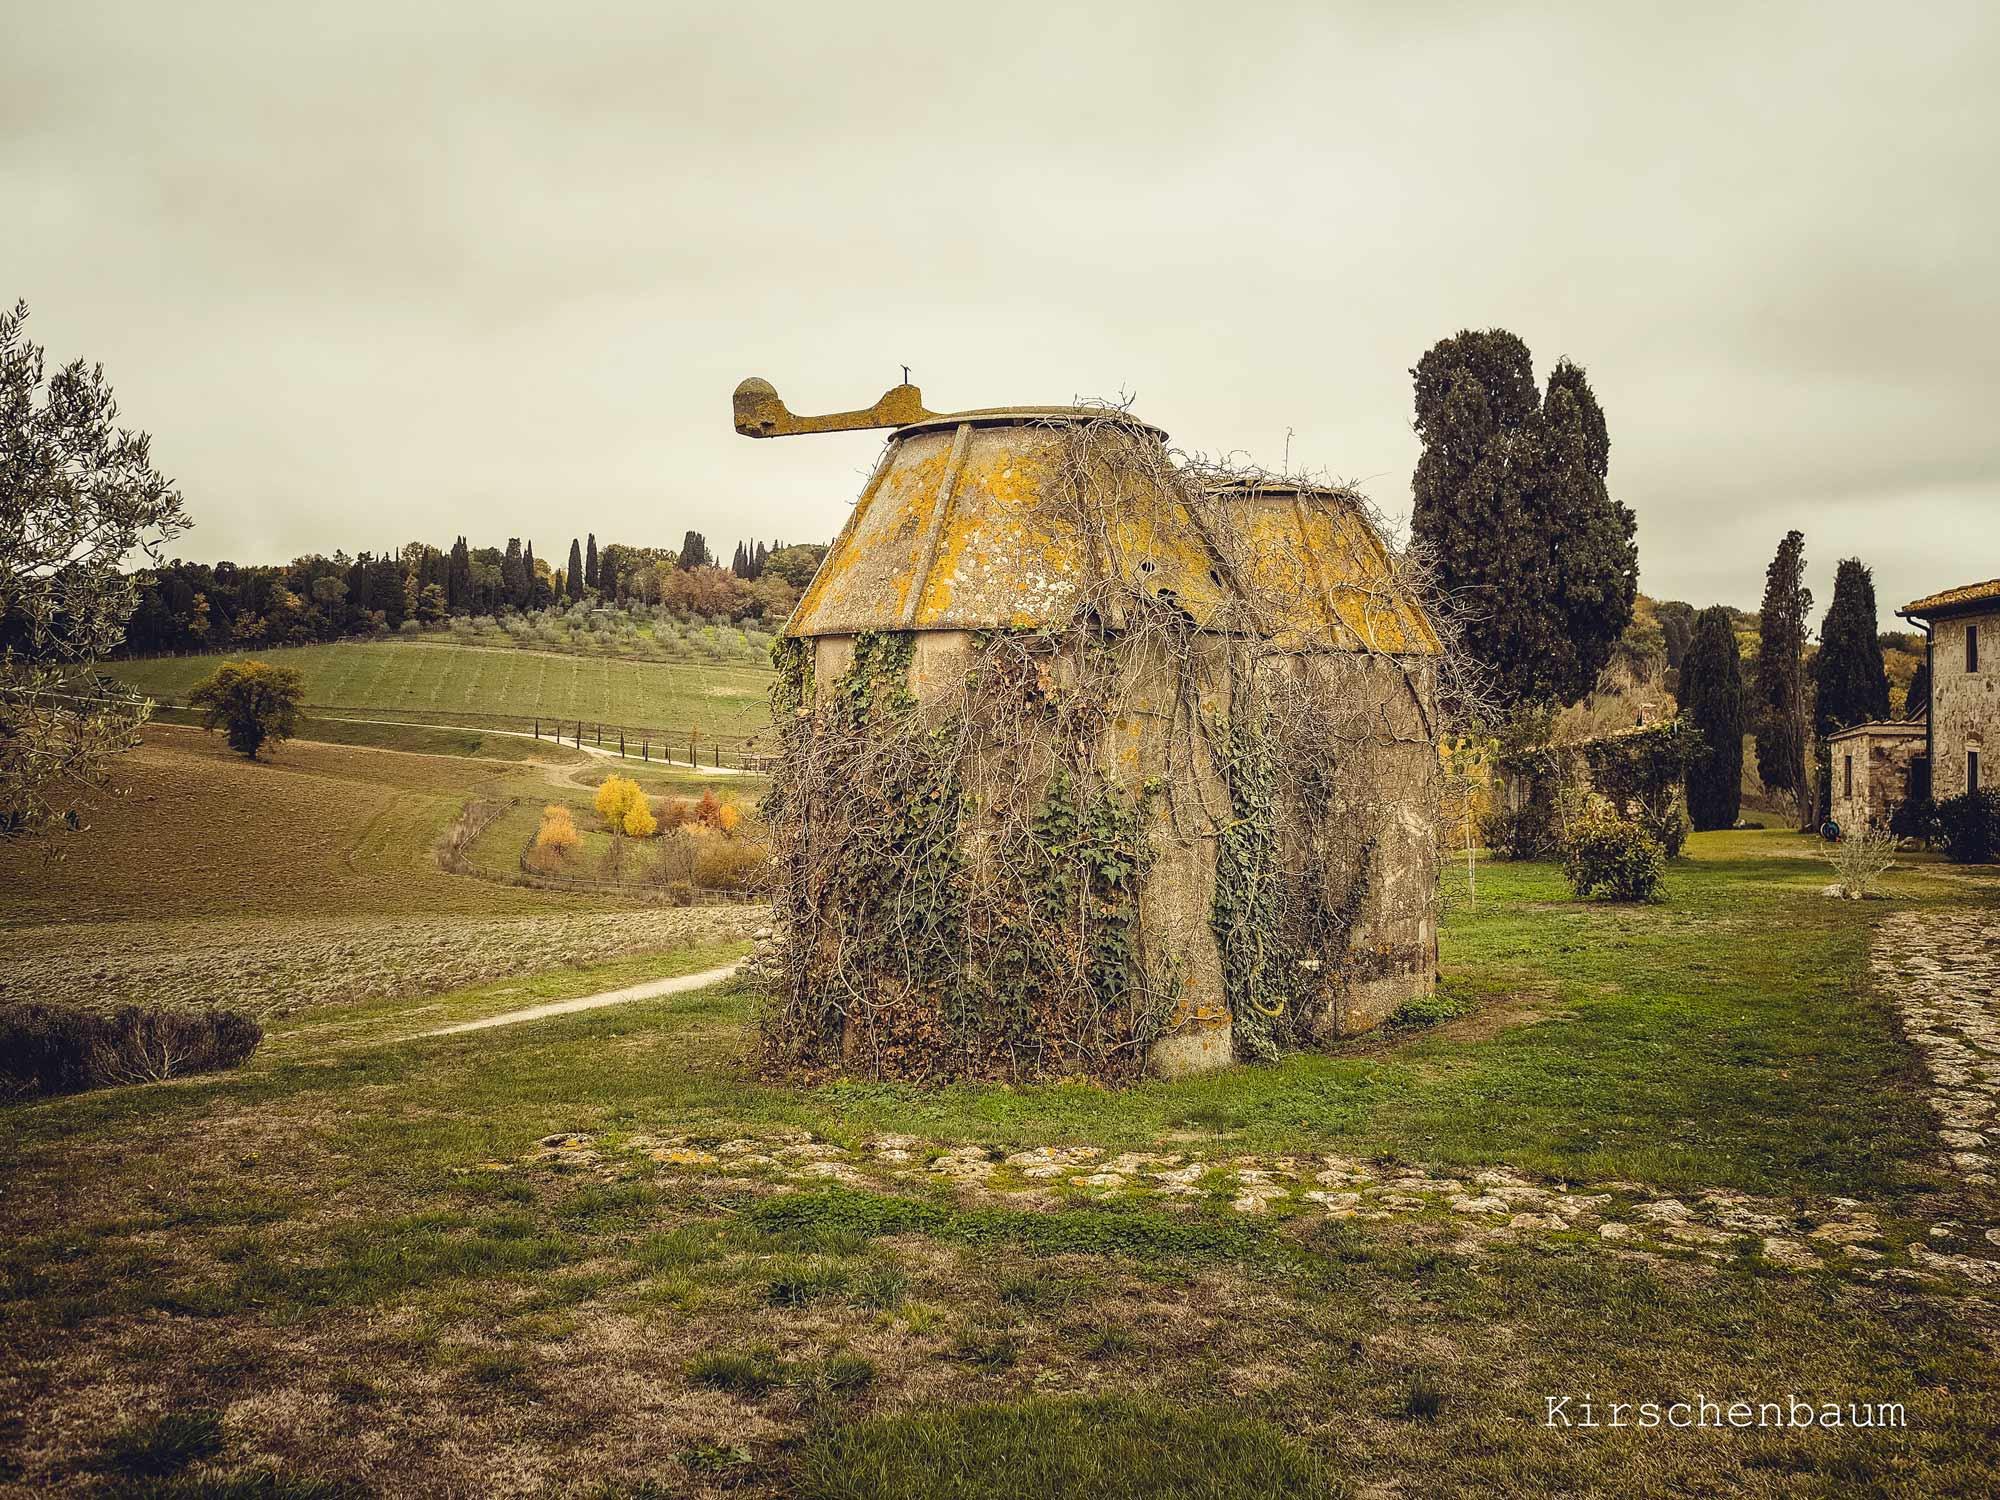 Fotografie casale in toscana - Casale in toscana ...